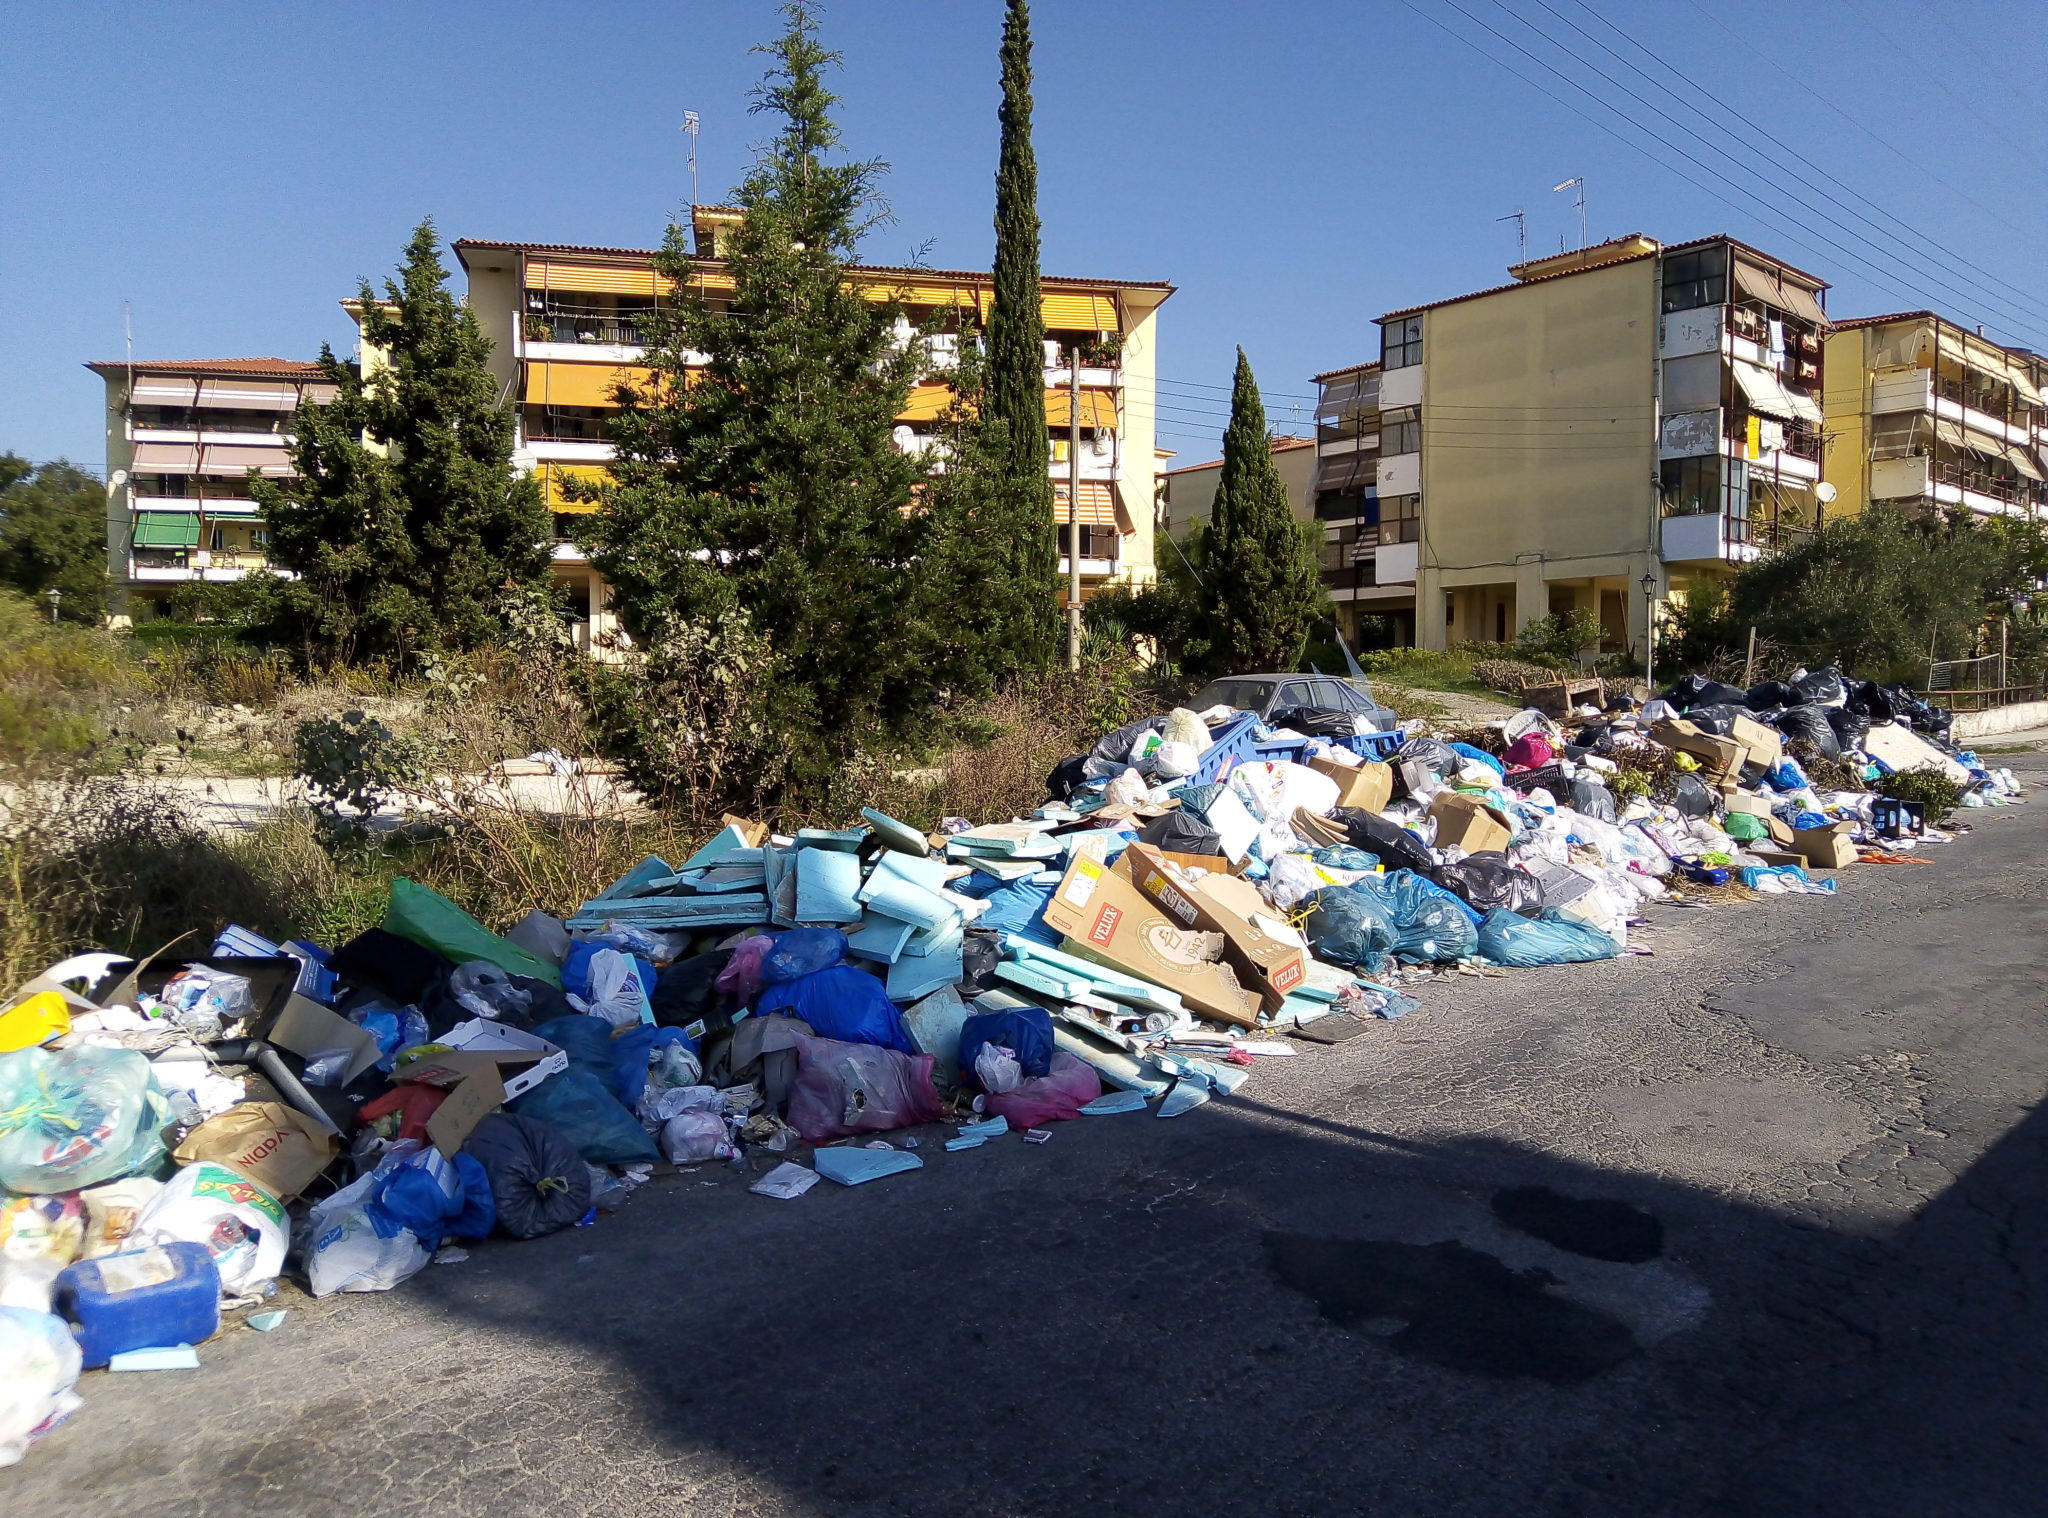 Photo of Κουλίνα άλλο ένα παρατημένο προάστιο για Νικολούζο-Ασπιώτη…Τους έπνιξαν στα σκουπίδια..Κίνδυνος επιδημιών